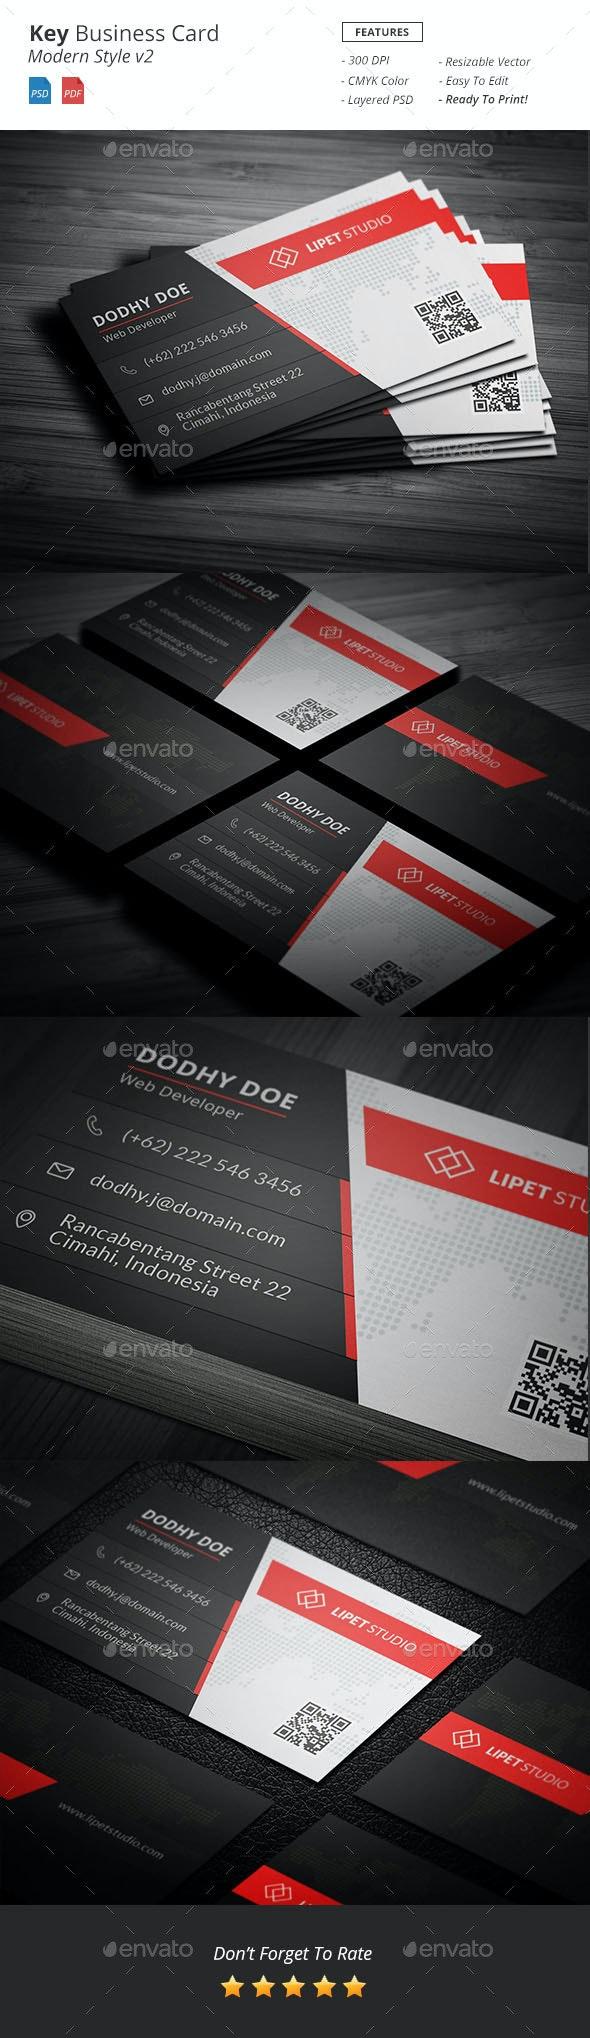 Key - Modern Business Card Template v2 - Business Cards Print Templates